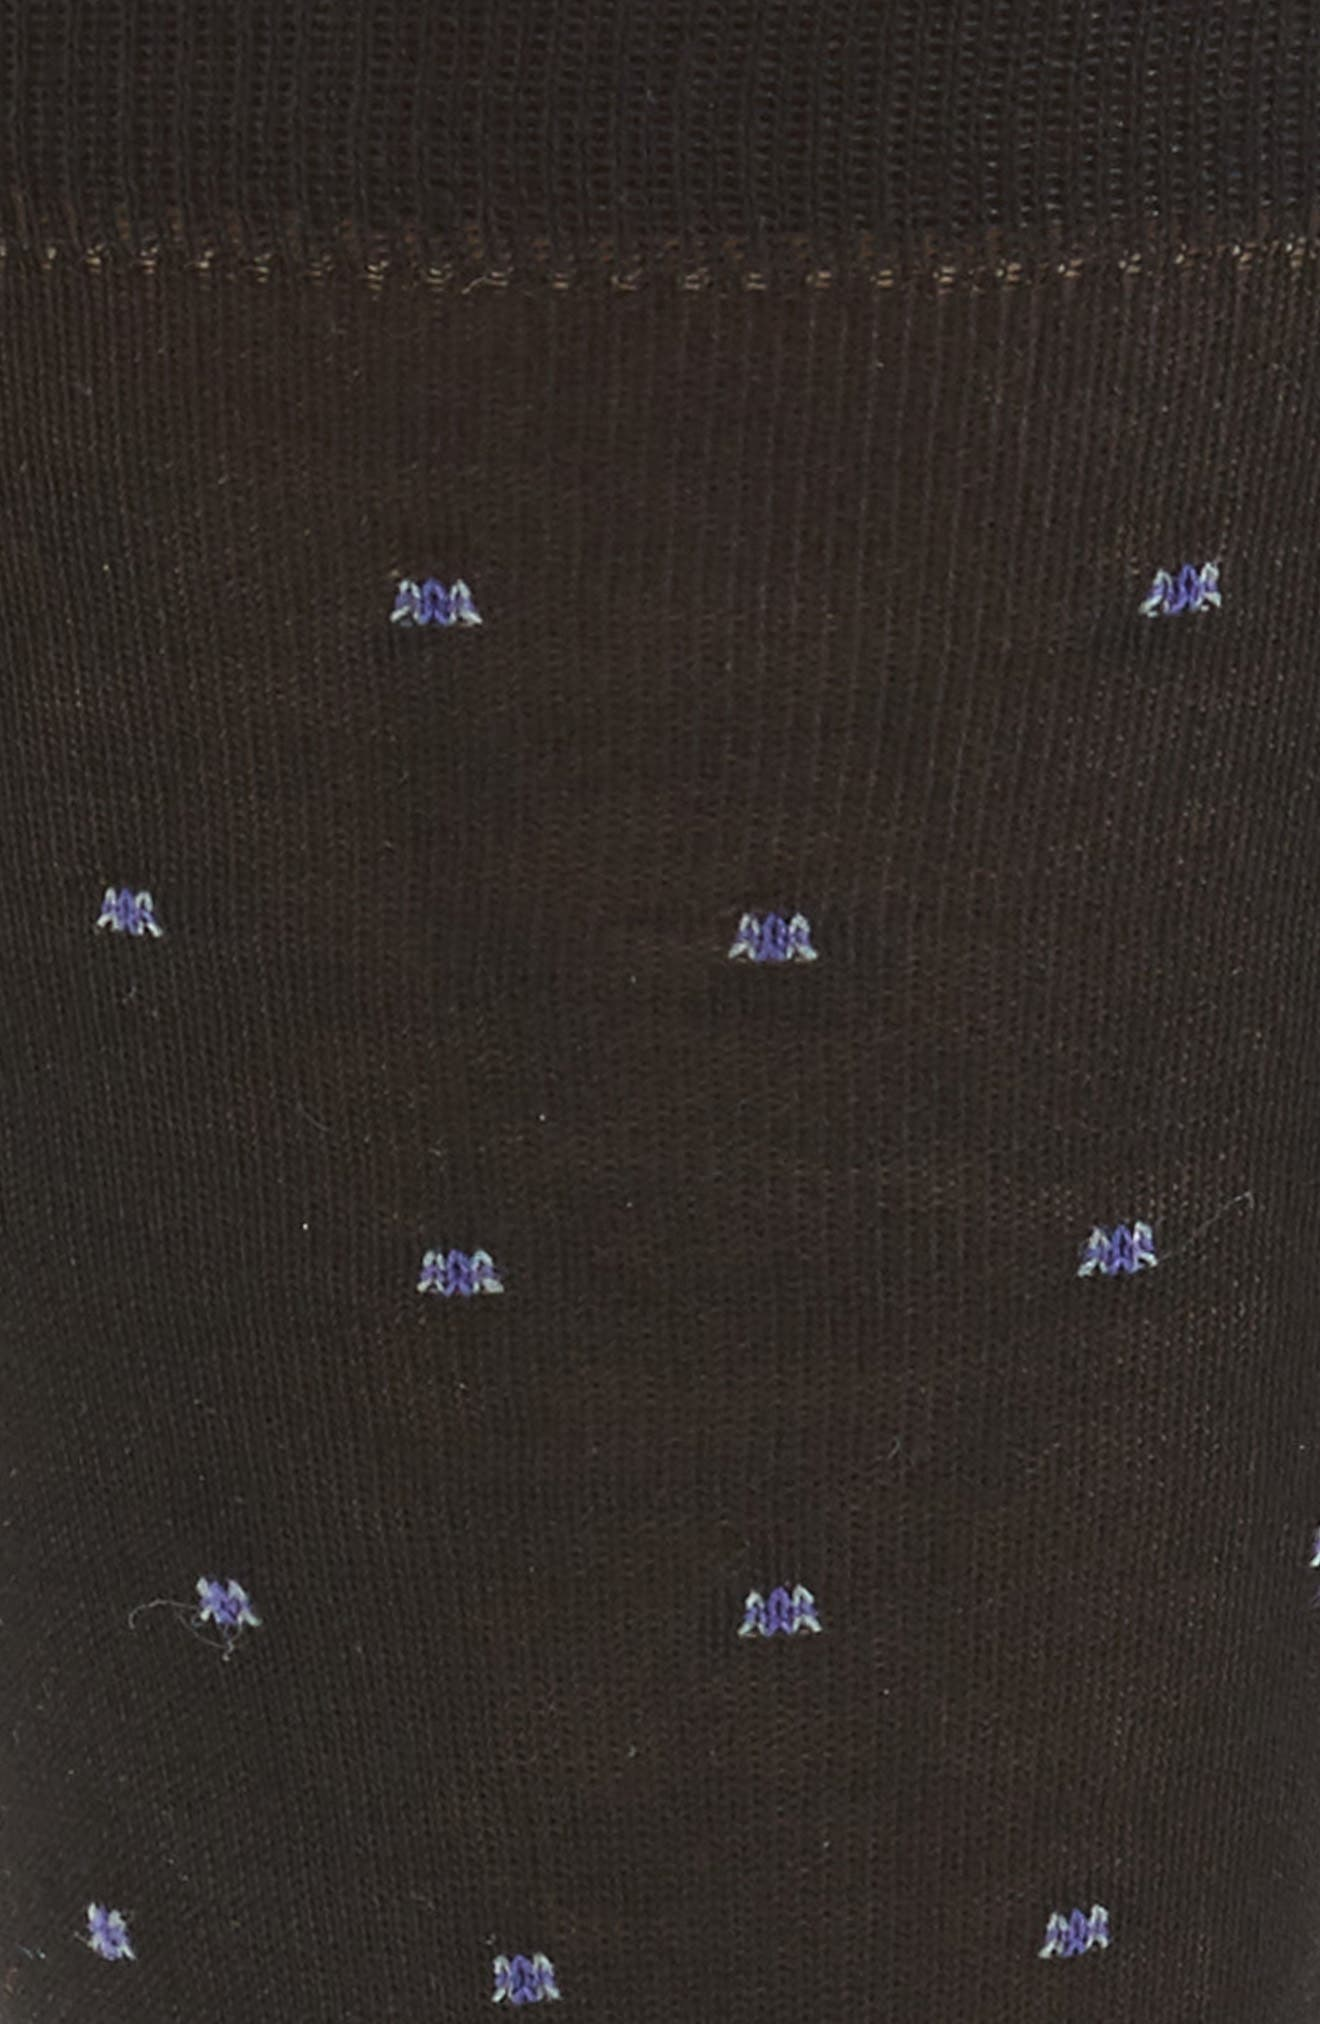 Balfour Dot Socks,                             Alternate thumbnail 2, color,                             001